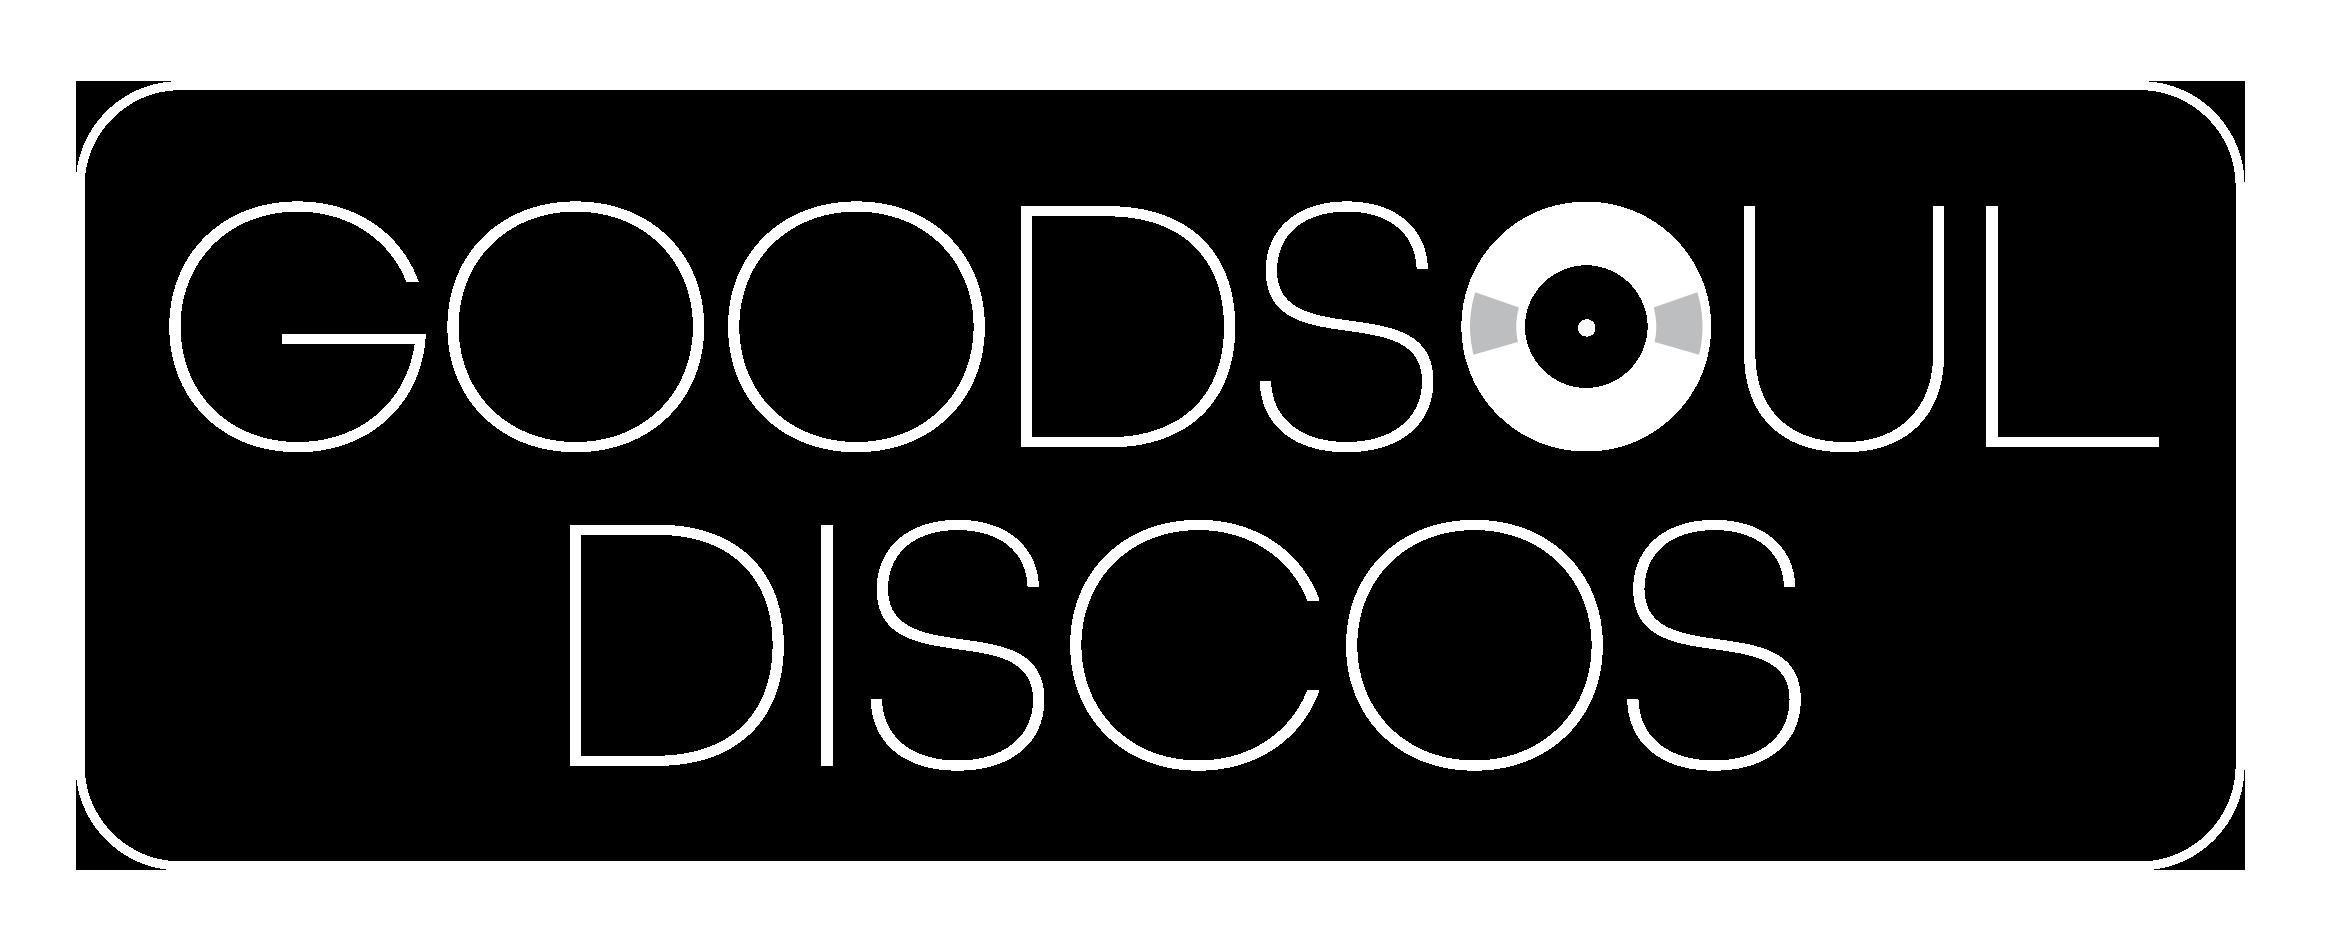 Goodsoul Discos